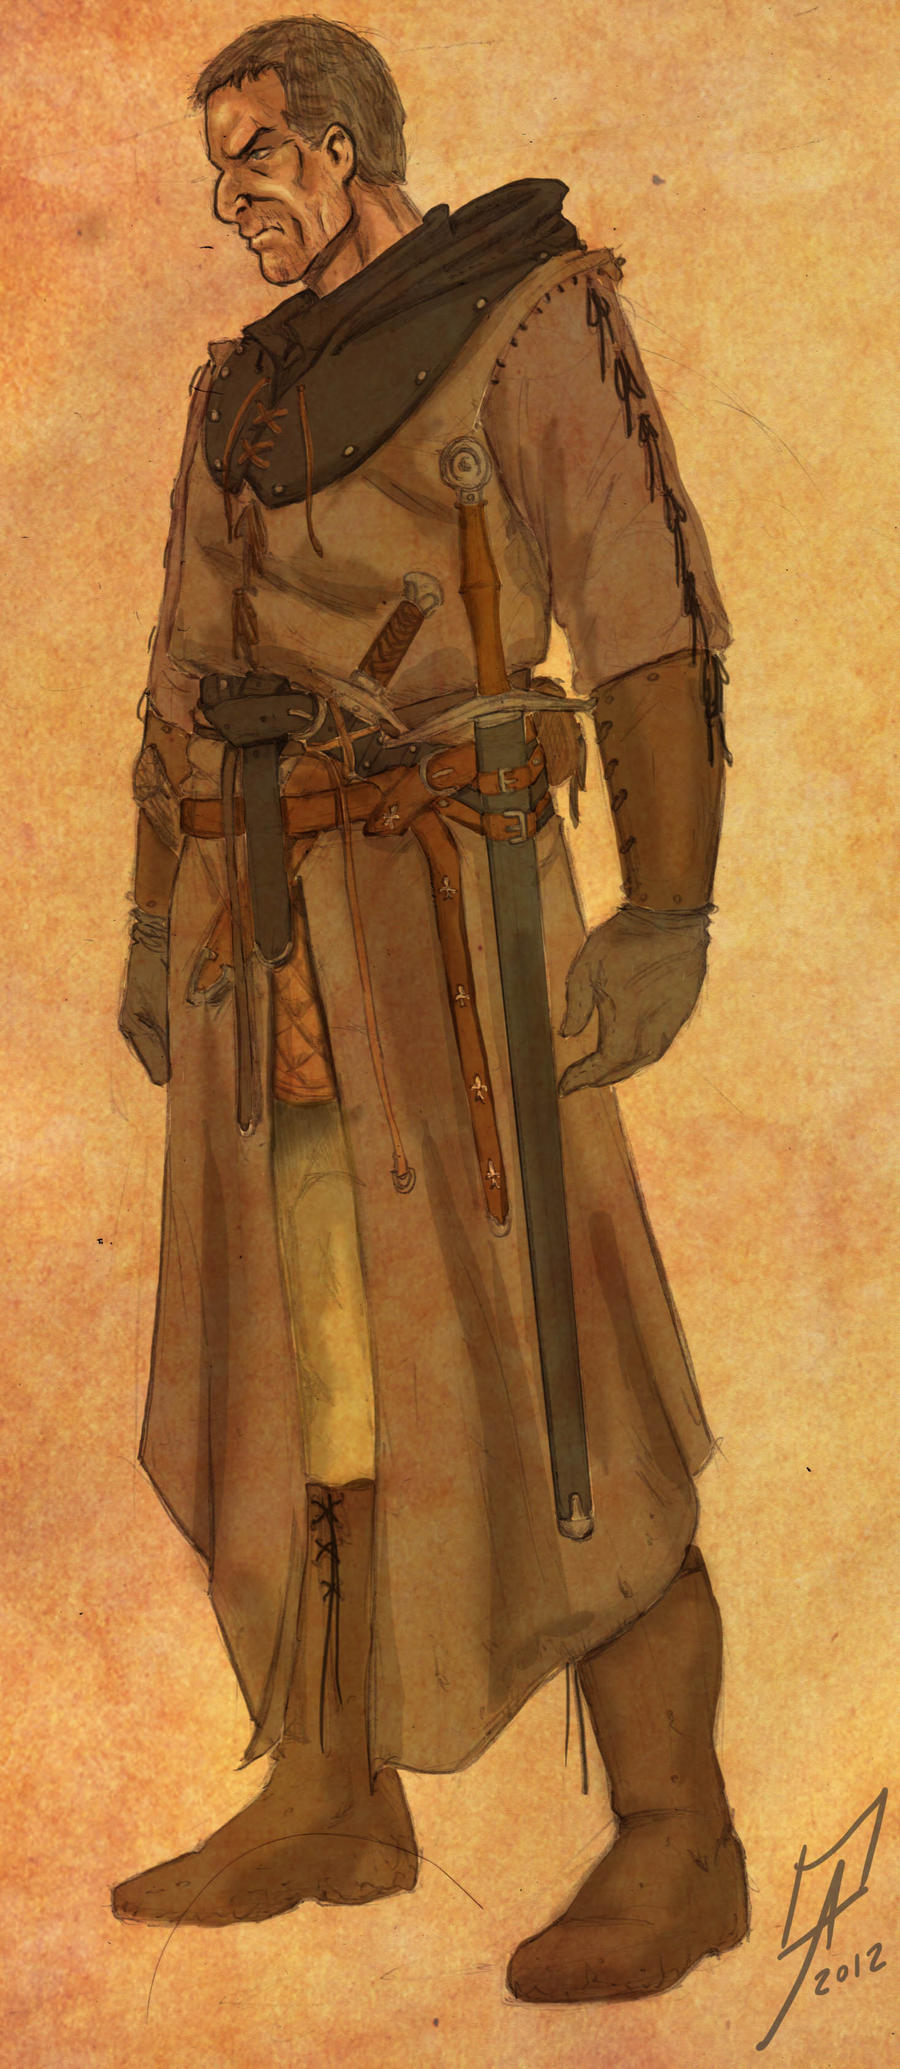 let__s_go_medieval_by_ninjamastertk-d5f0l29.jpg